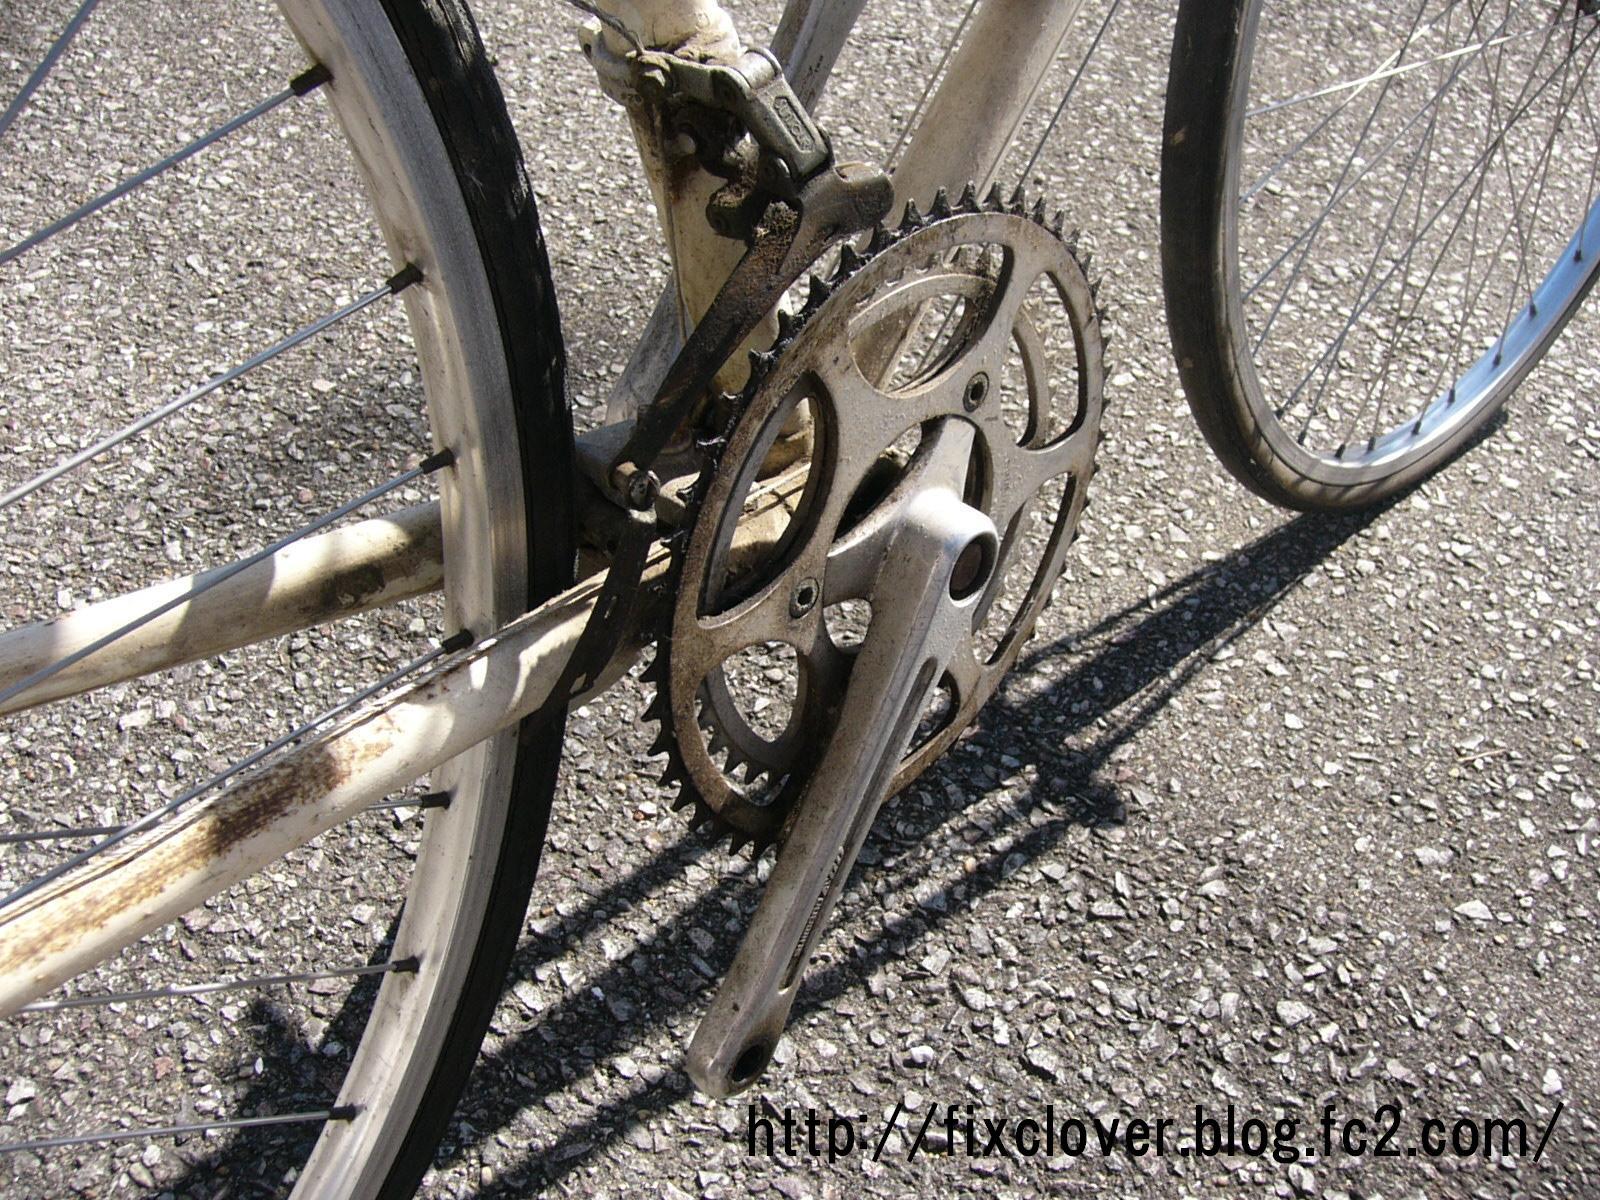 BBベアリング破損 - 自転車の ...